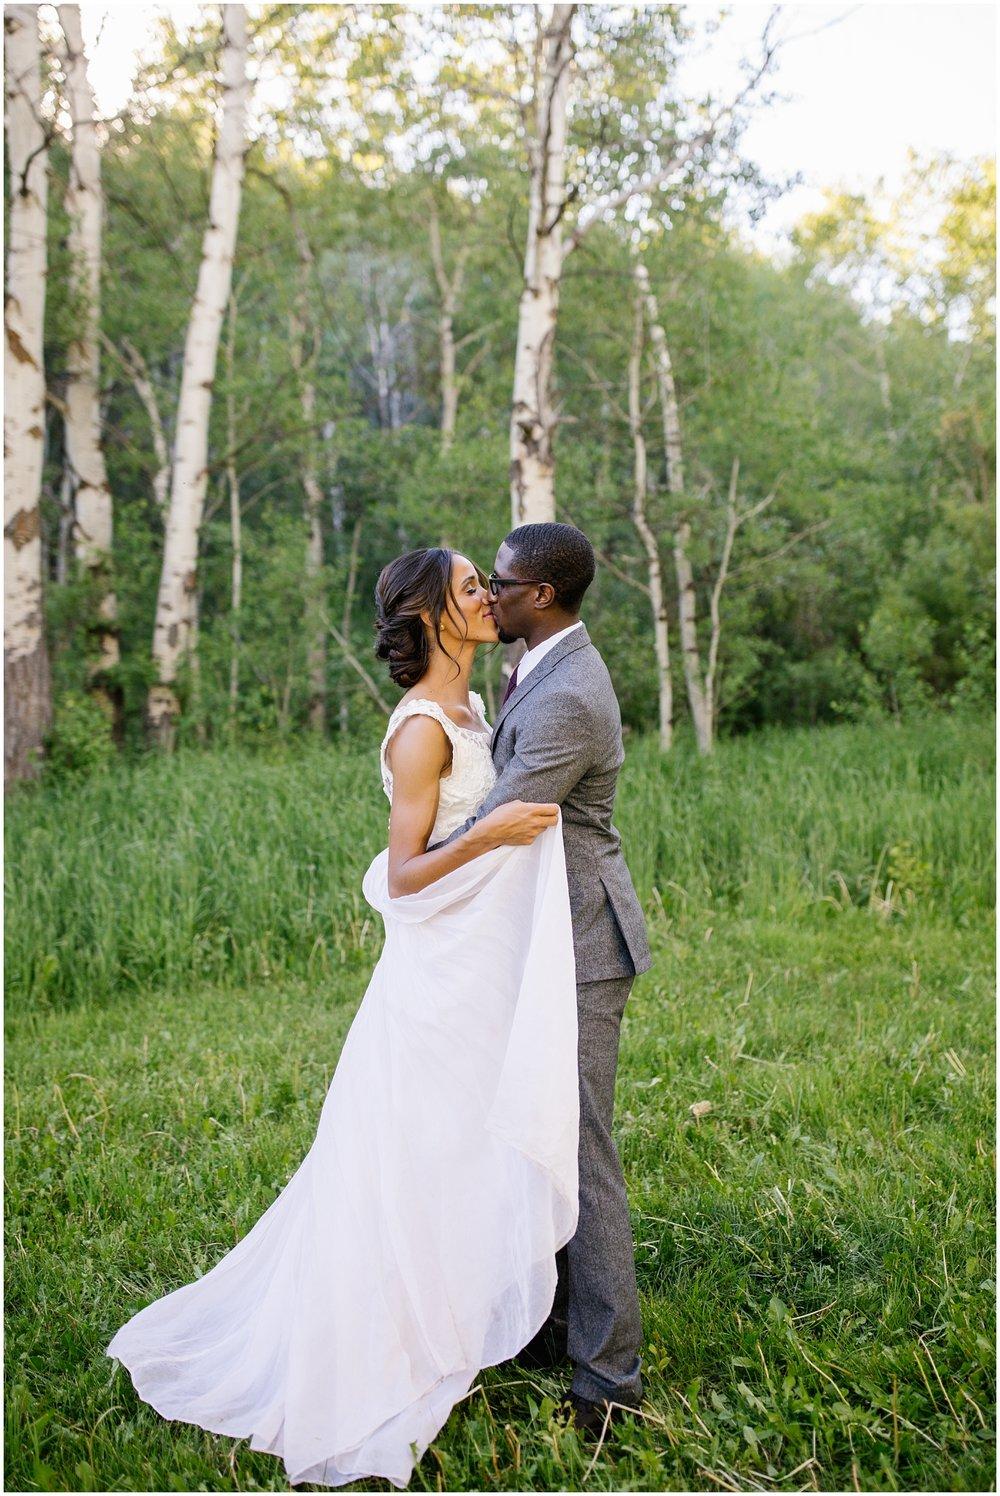 TreeHorseShoot-64_Lizzie-B-Imagery-Utah-Wedding-Photographer-Salt-Lake-City-Park-City-Oakley.jpg